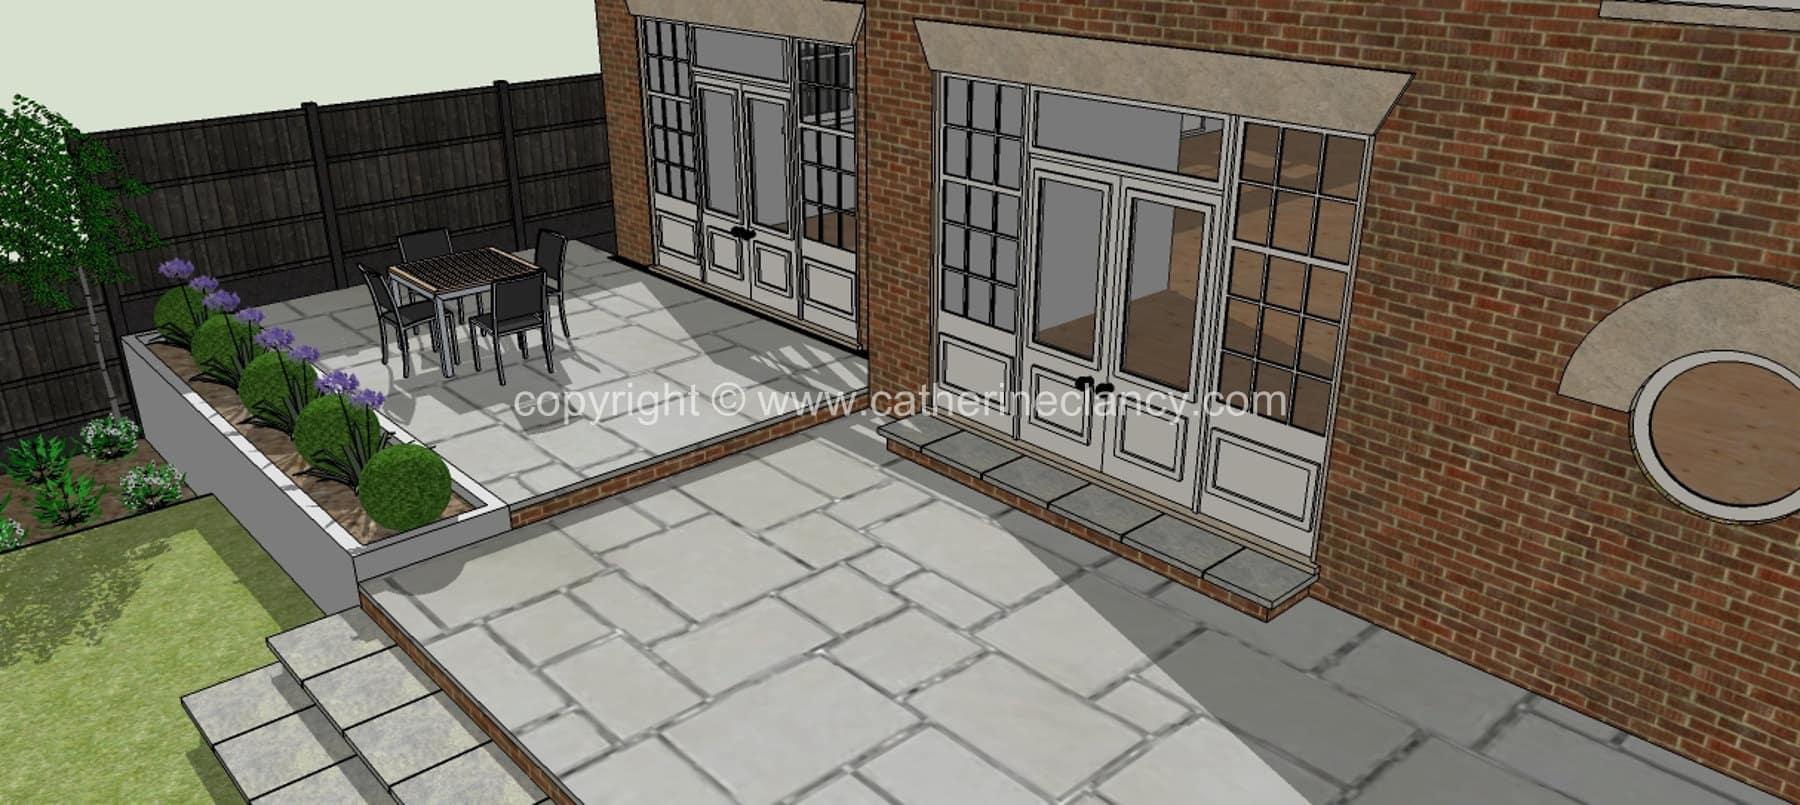 hendon-grand-design-garden-6